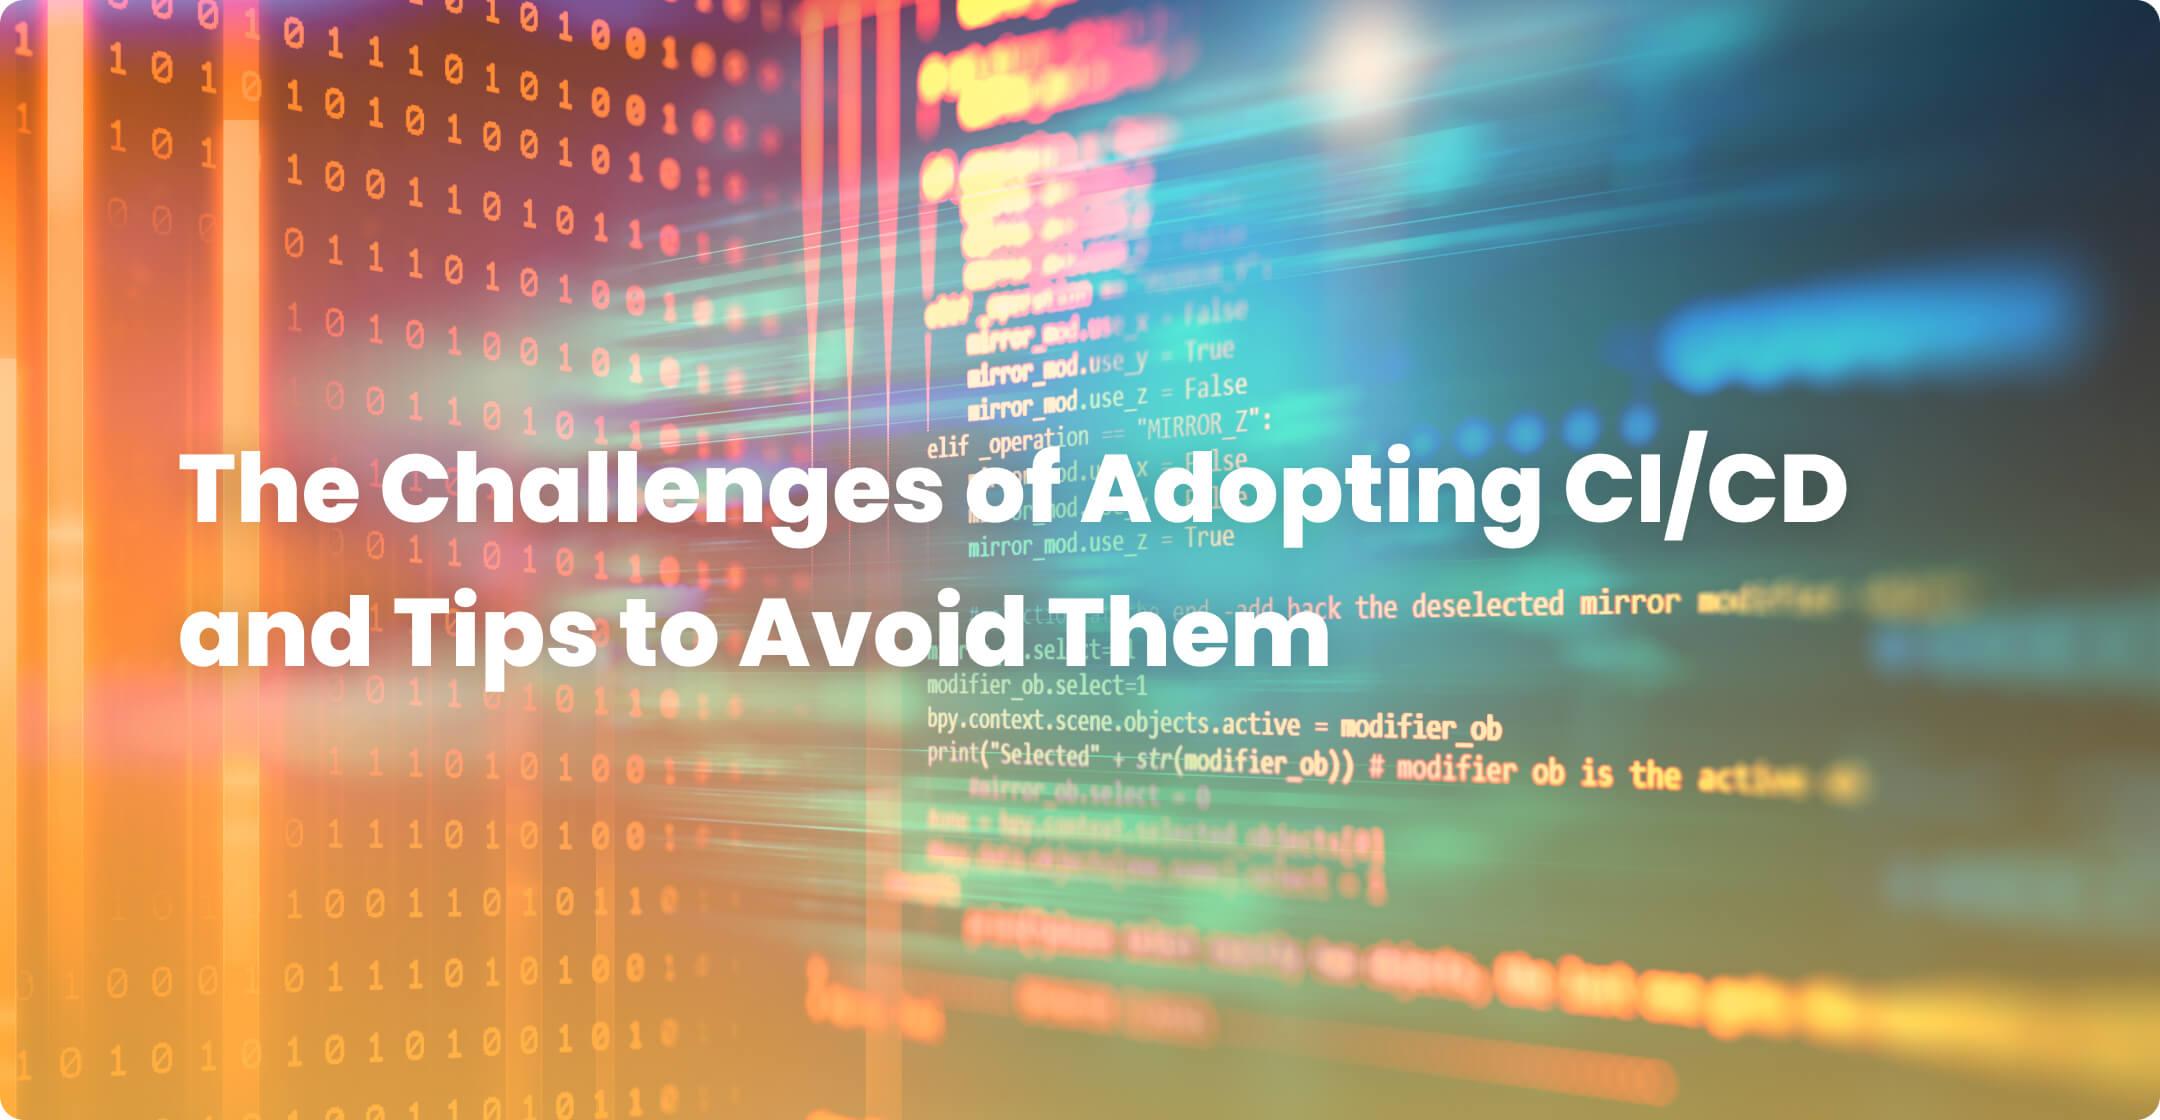 ci/cd challenges